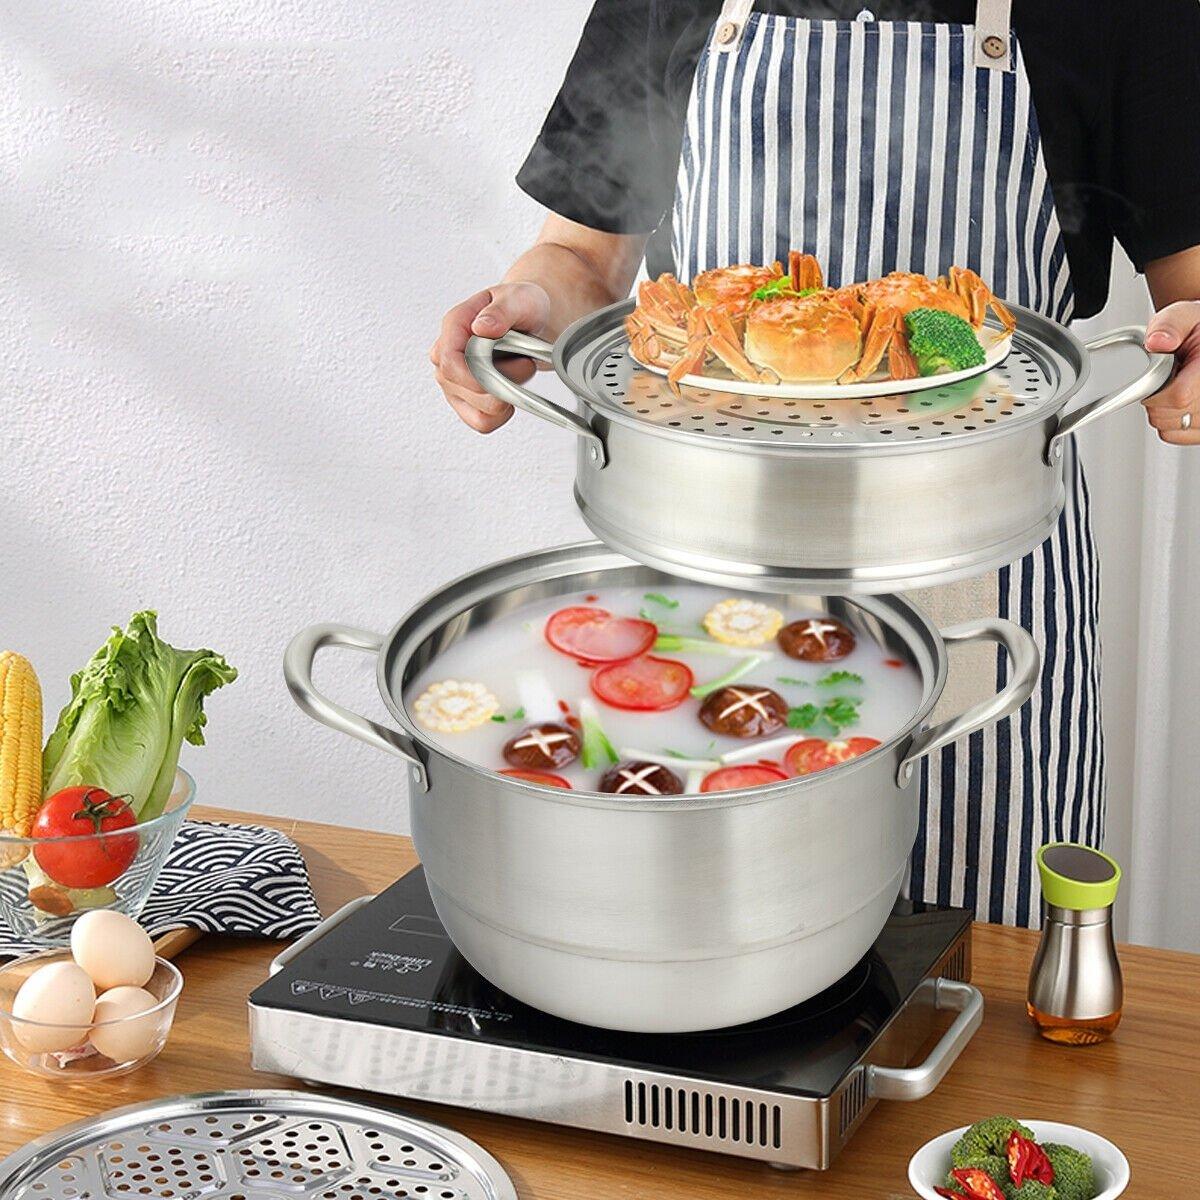 Image of 3 Tier Stainless Steel Cookware Pot Saucepot Steamer